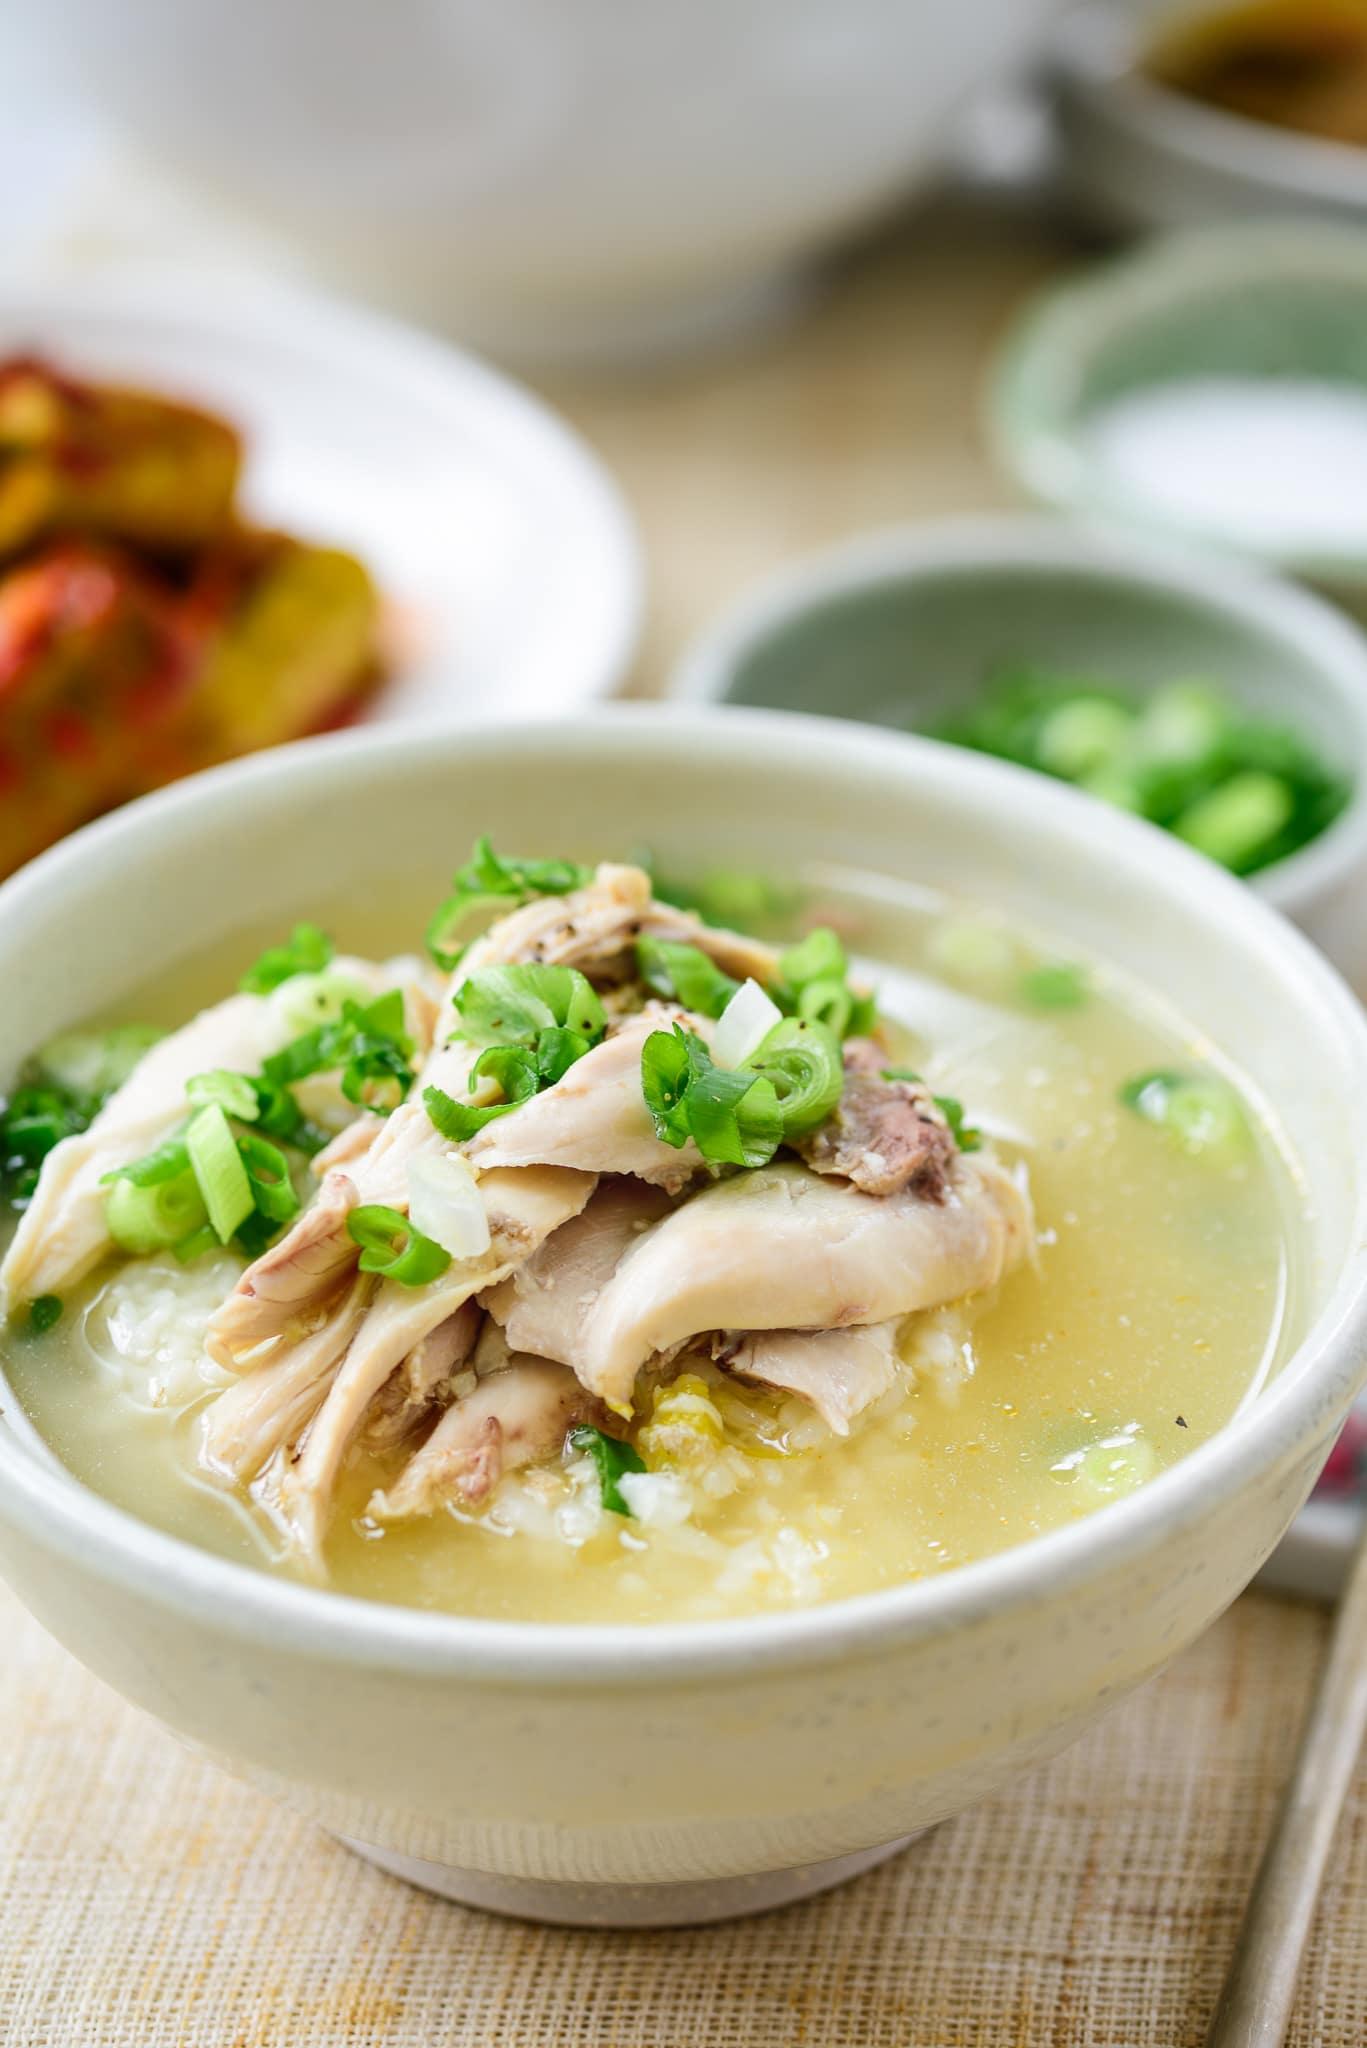 DSC2693 - Dak Gomtang (Korean Chicken Soup)